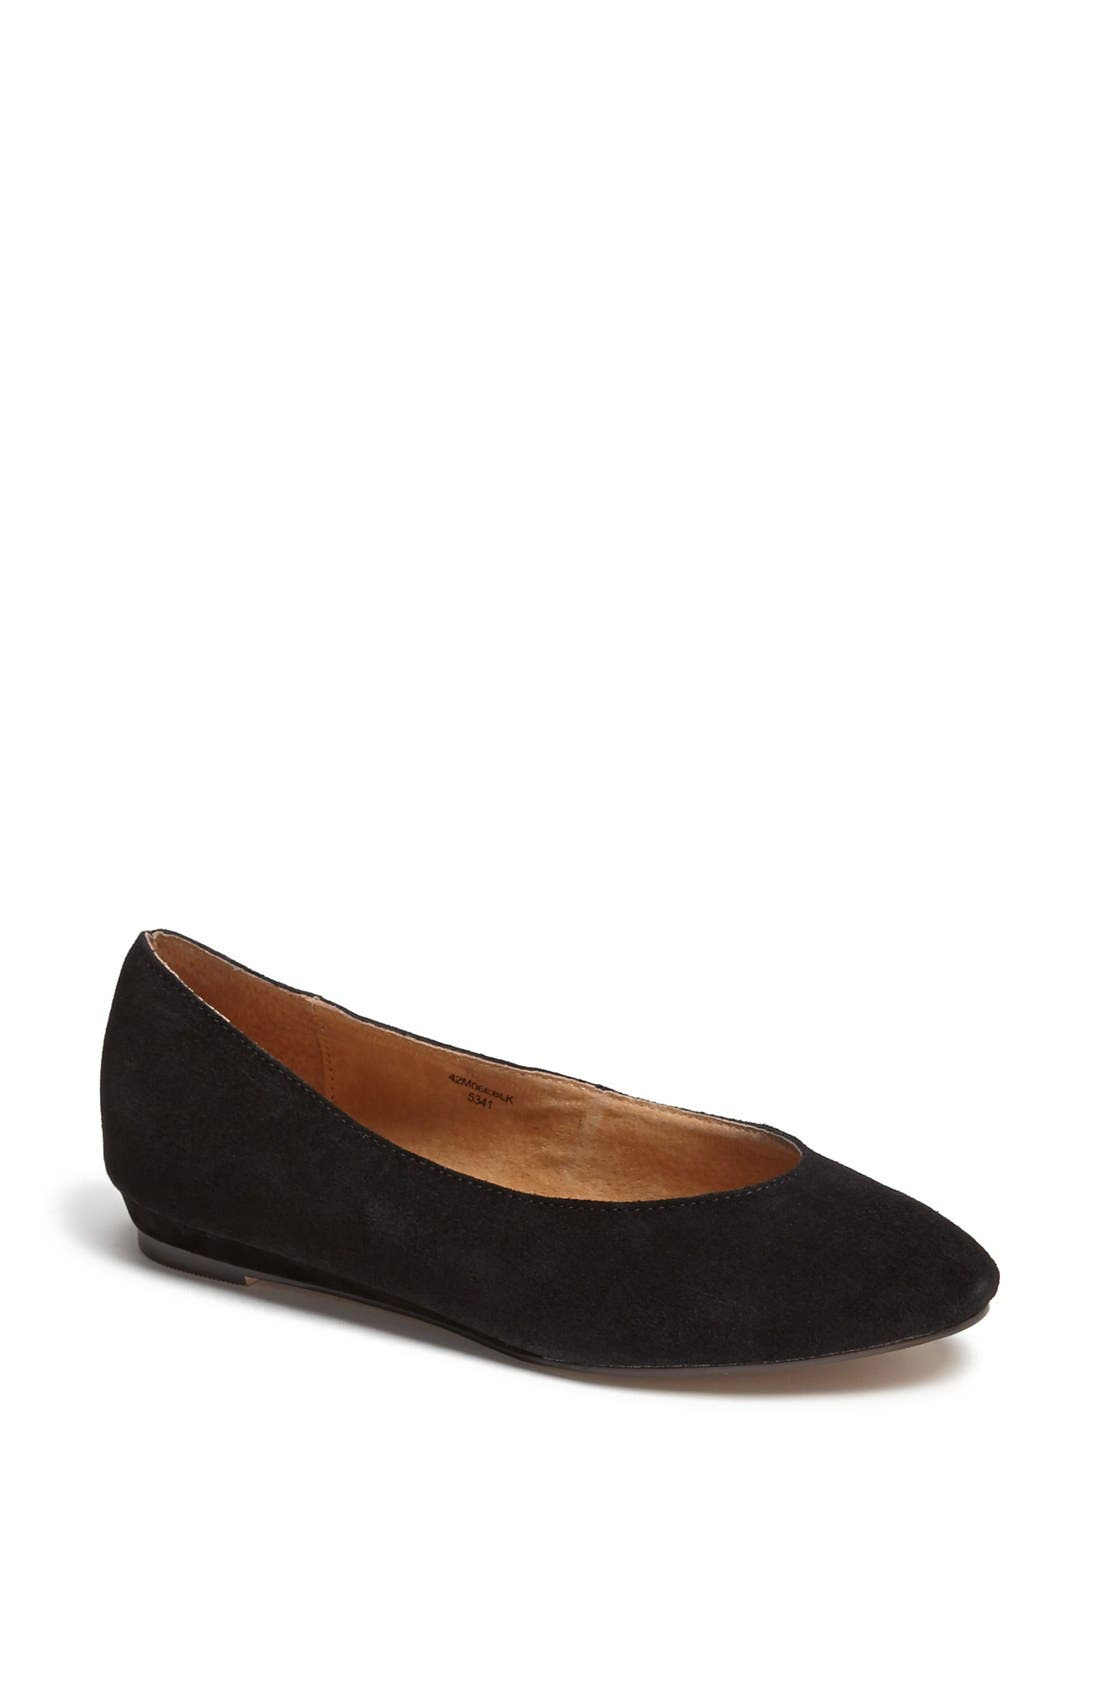 Alternate Image 1 Selected - Topshop 'Mello Mini Wedge' Court Shoe